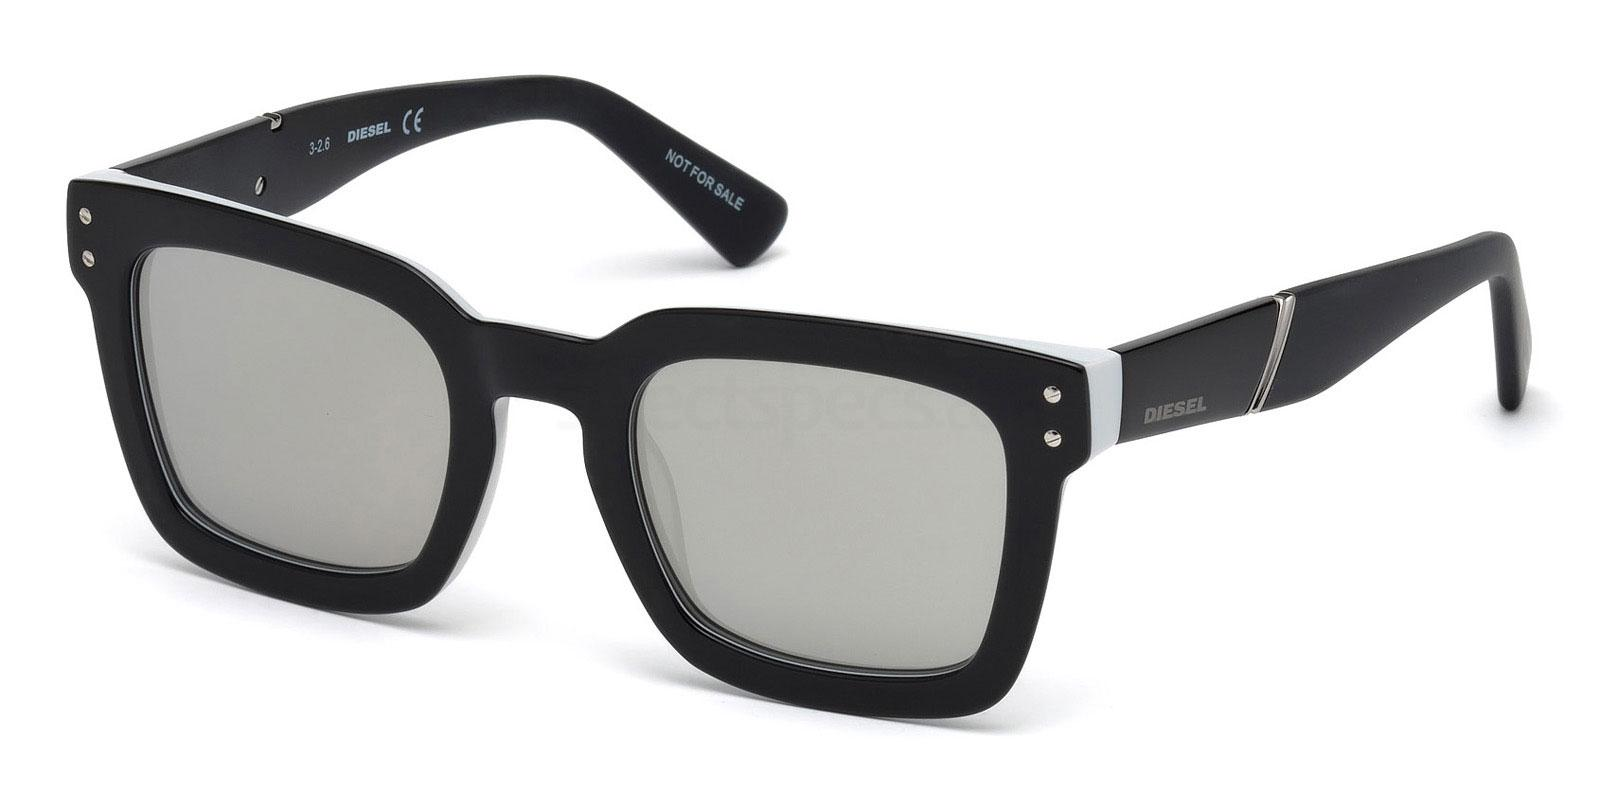 05C DL0229 Sunglasses, Diesel